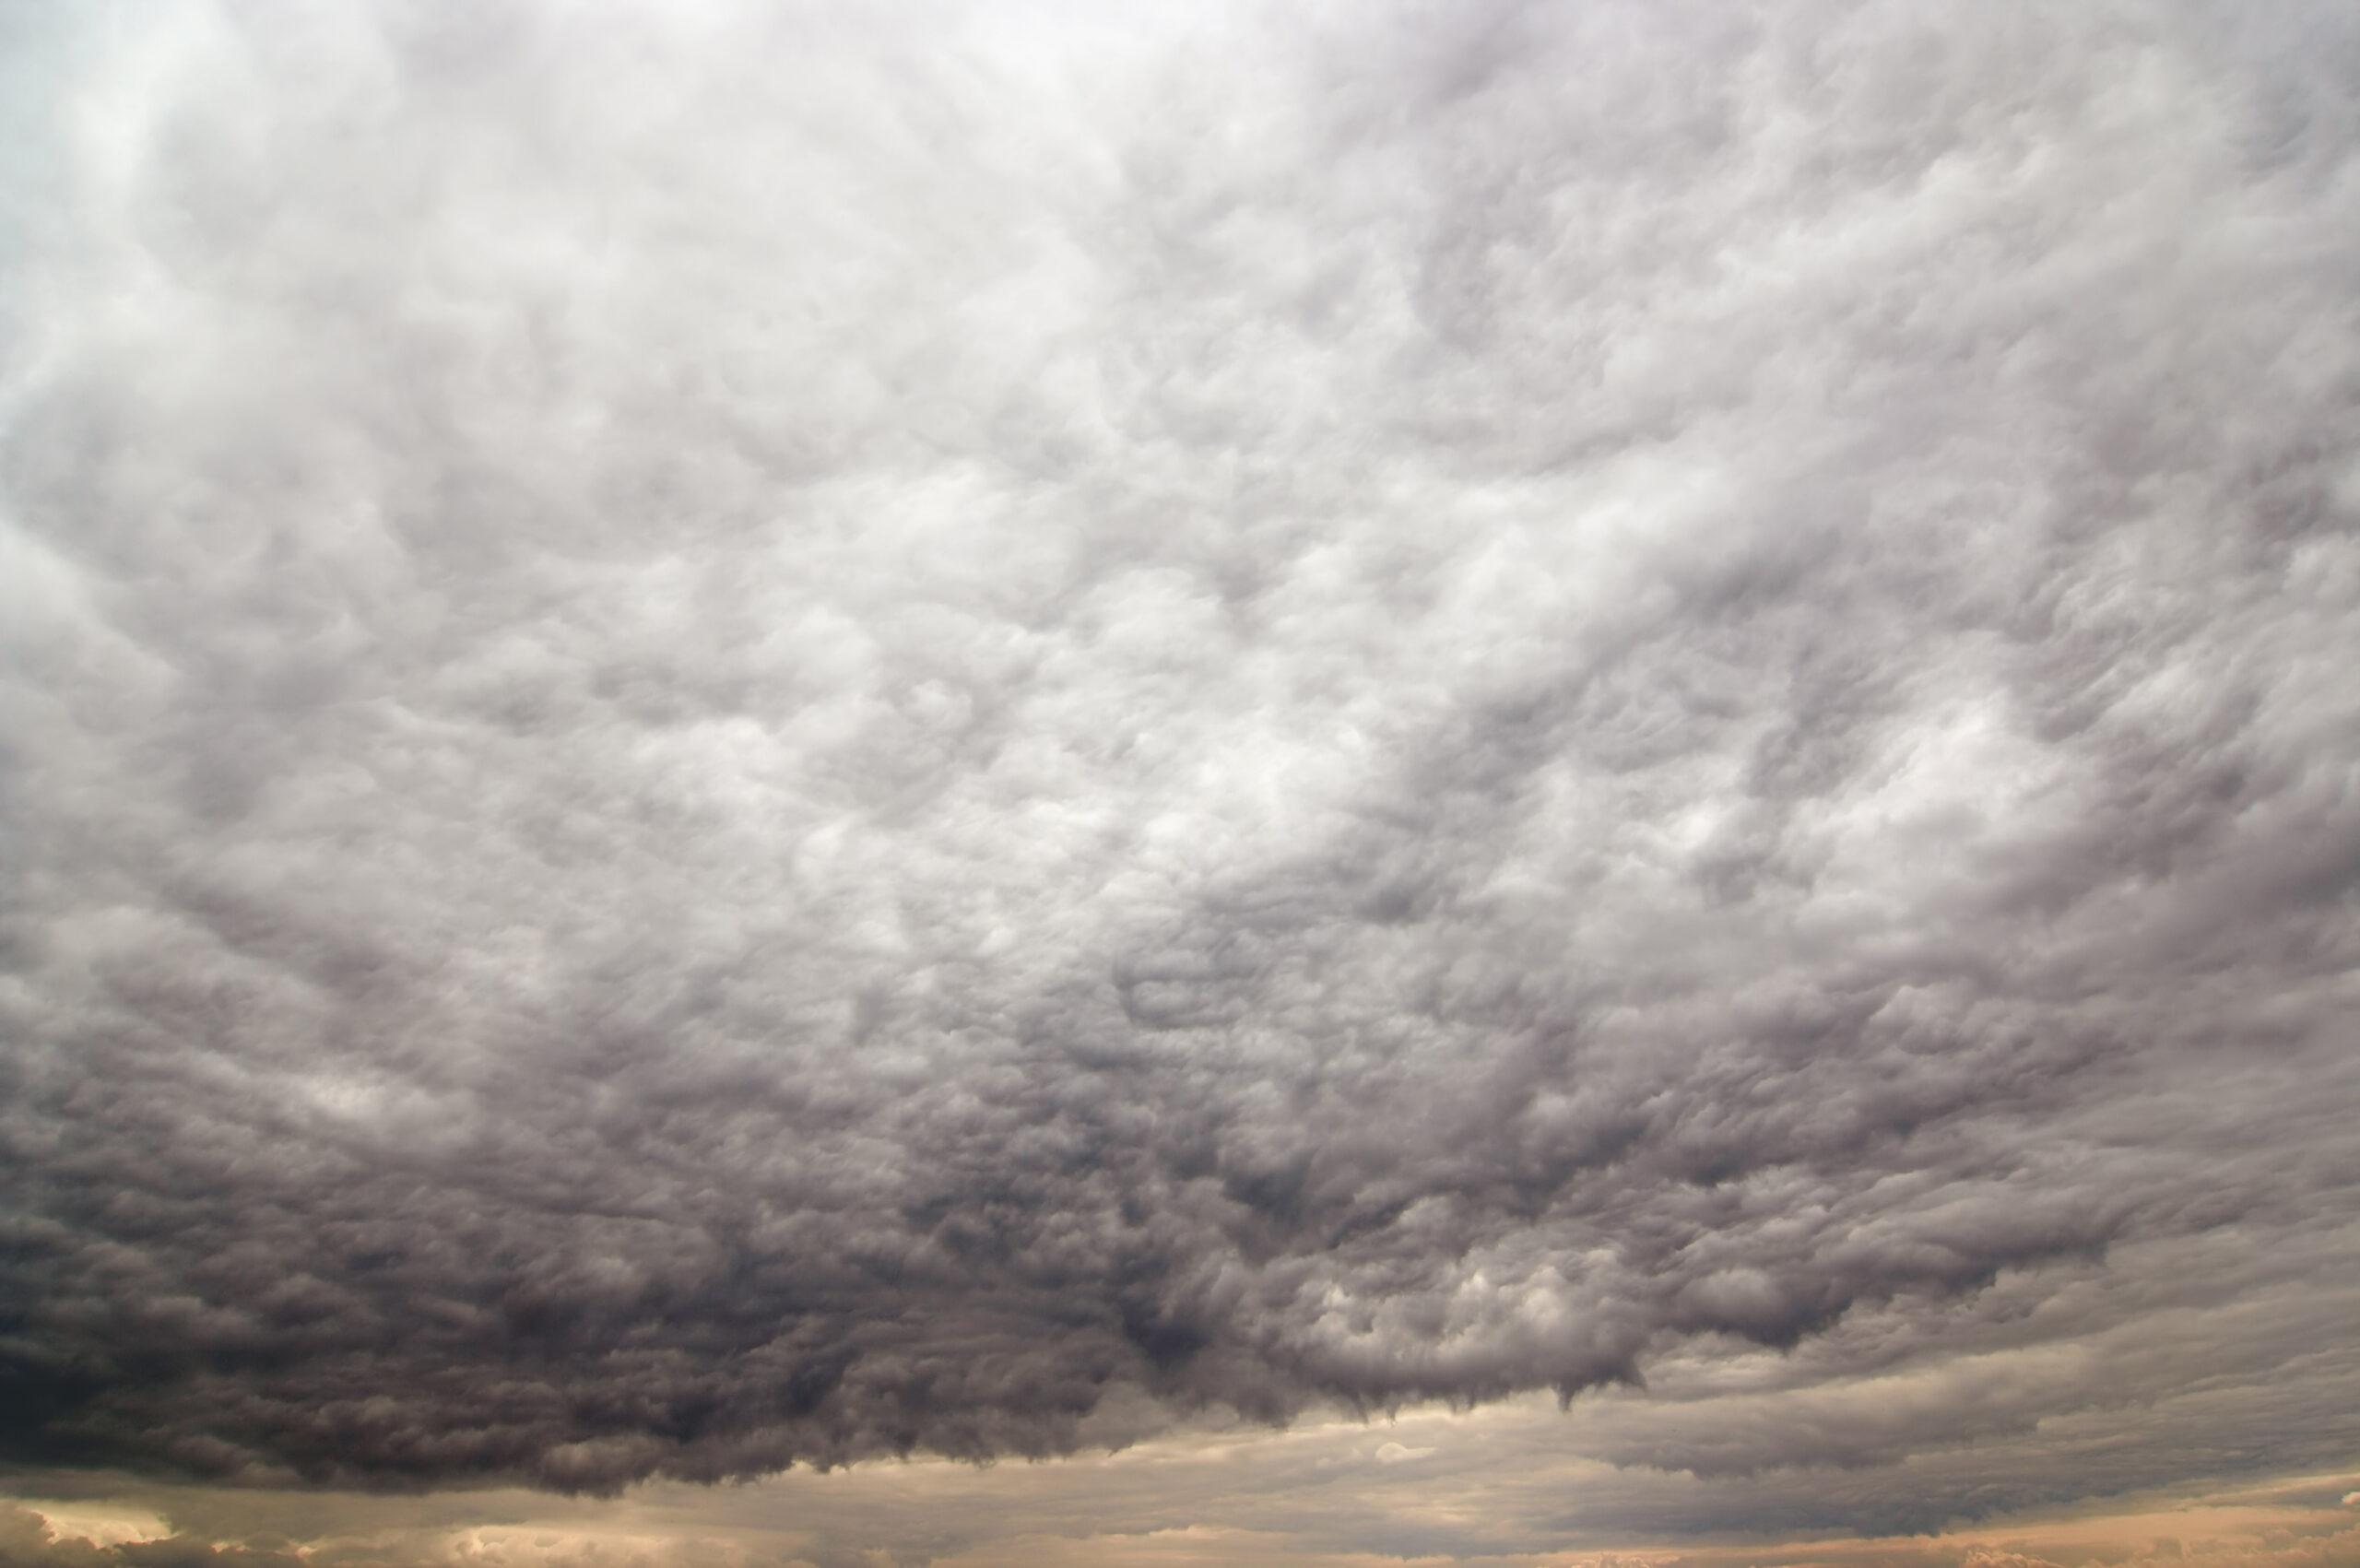 Bizarre storm clouds